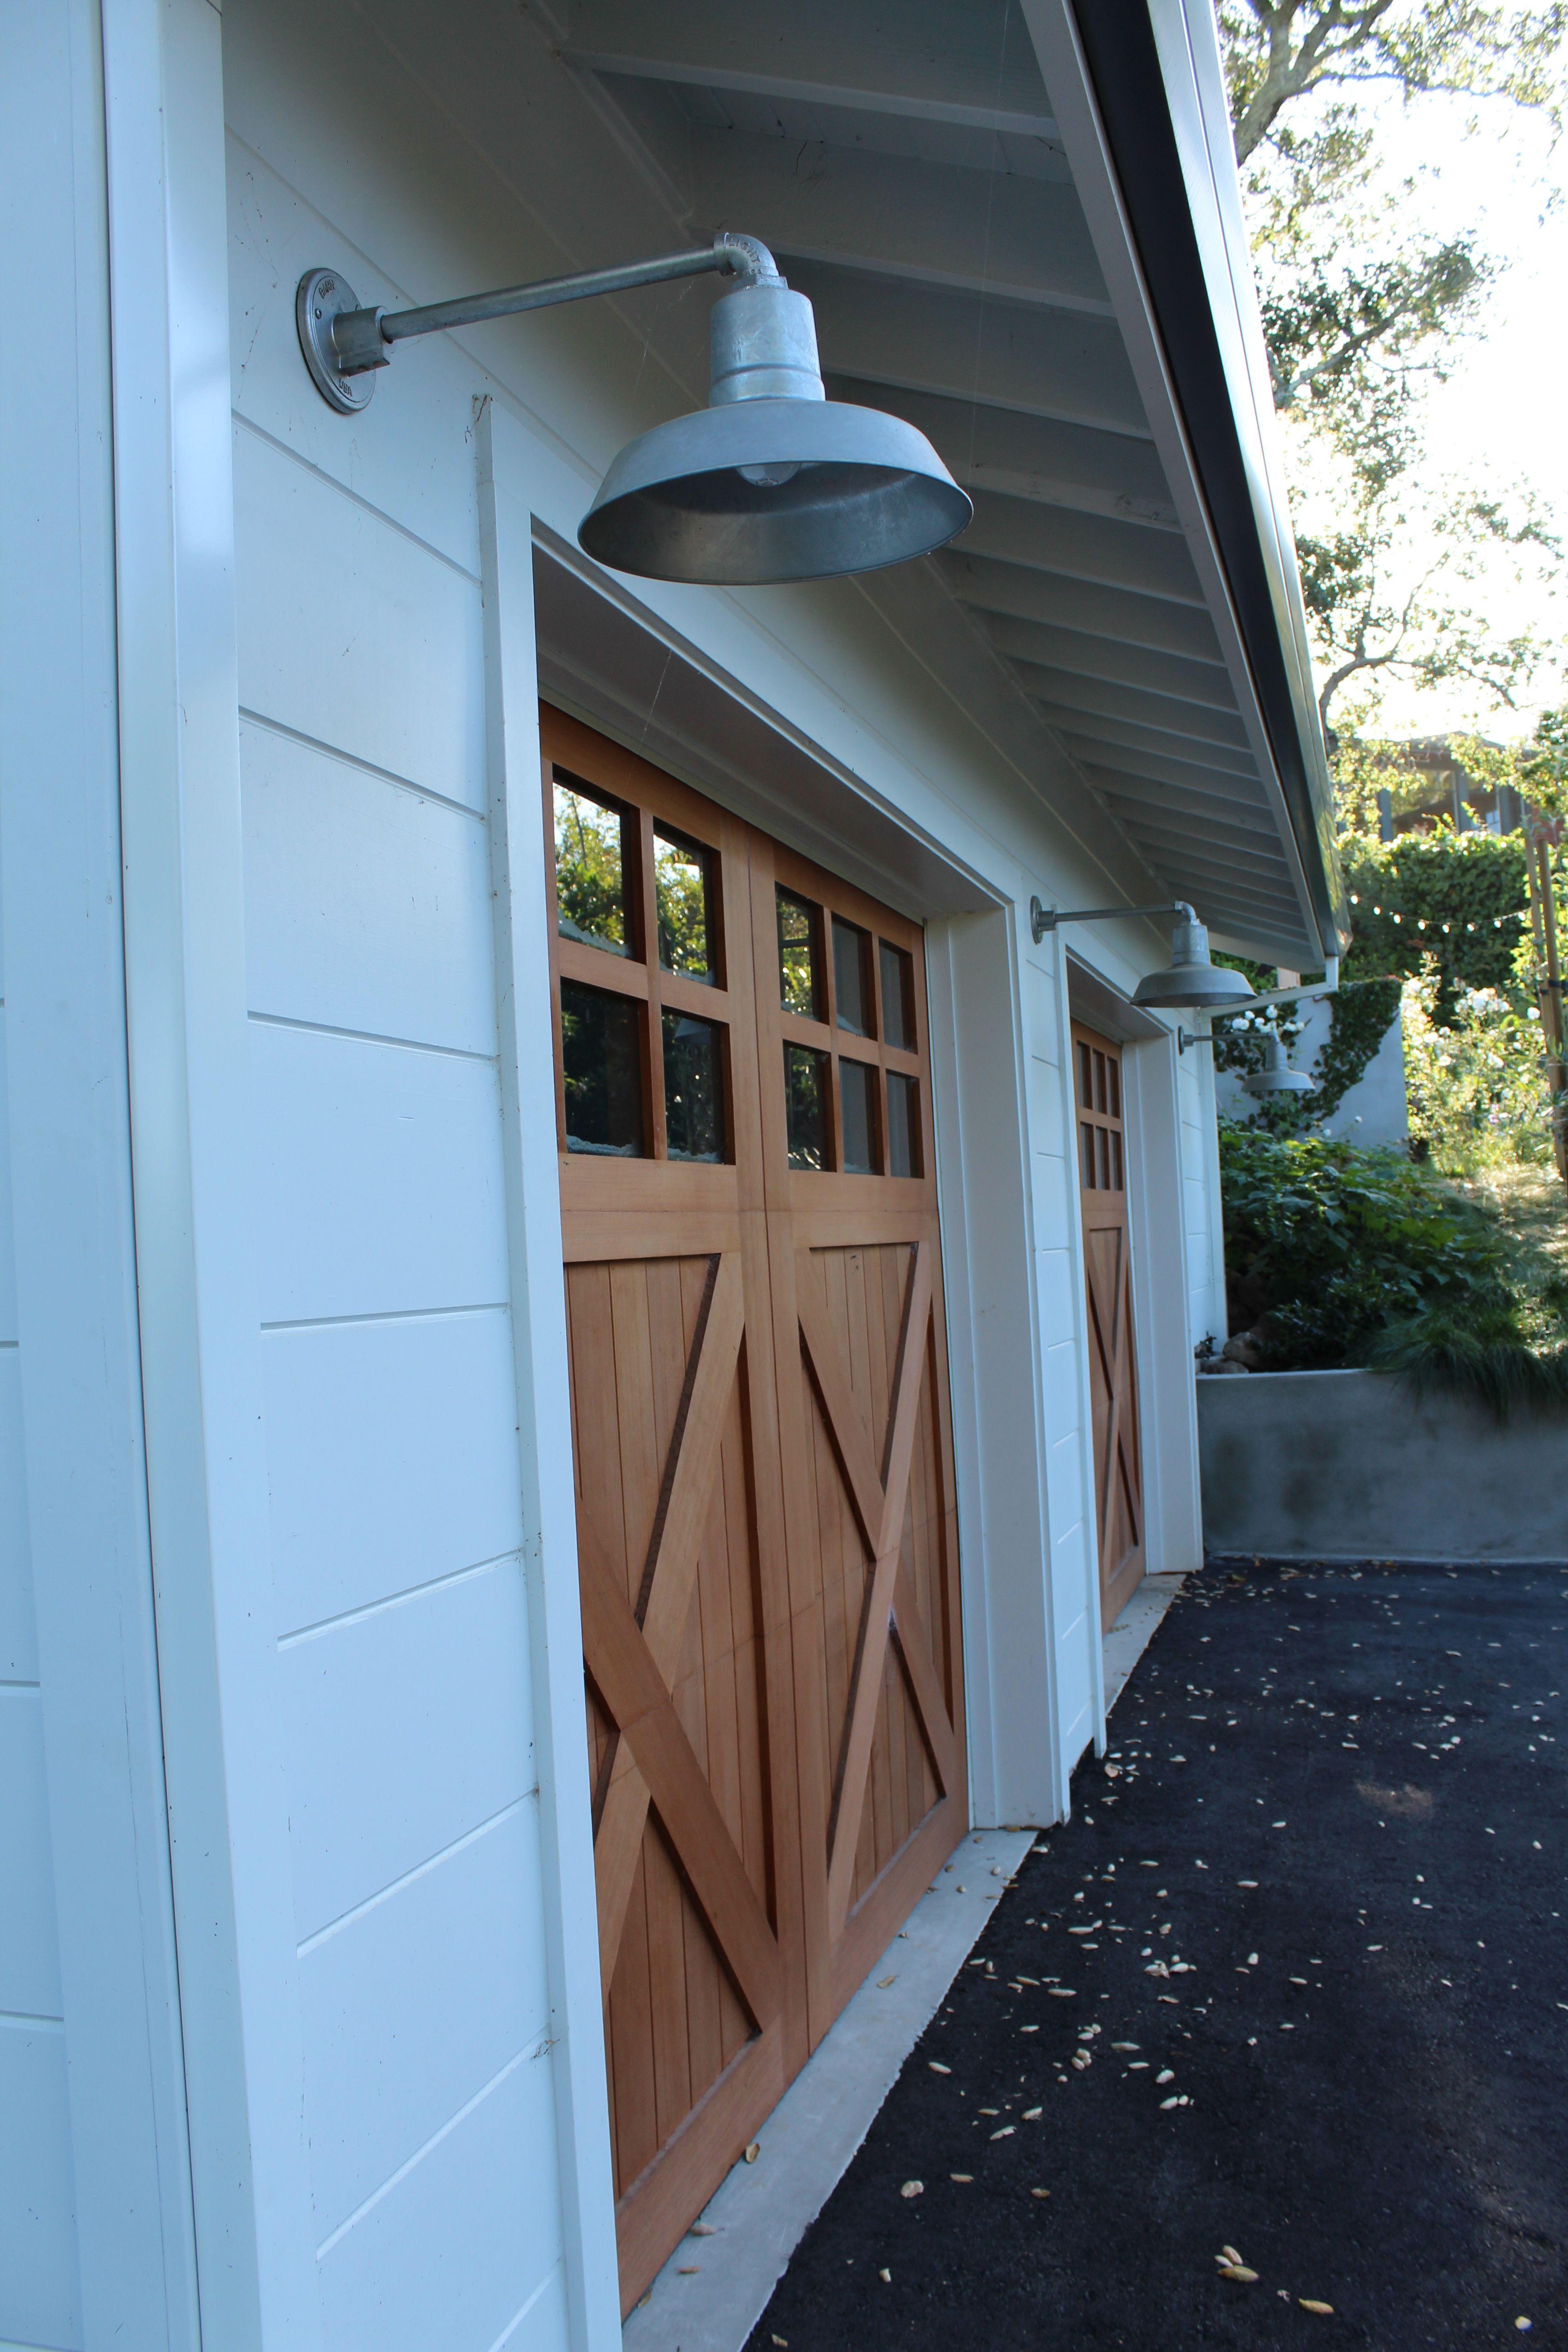 6a01287699c3f2970c01b7c79f992a970b Pi 3 456 5 184 Pixels Garage Door Design Modern Garage Doors Farmhouse Exterior